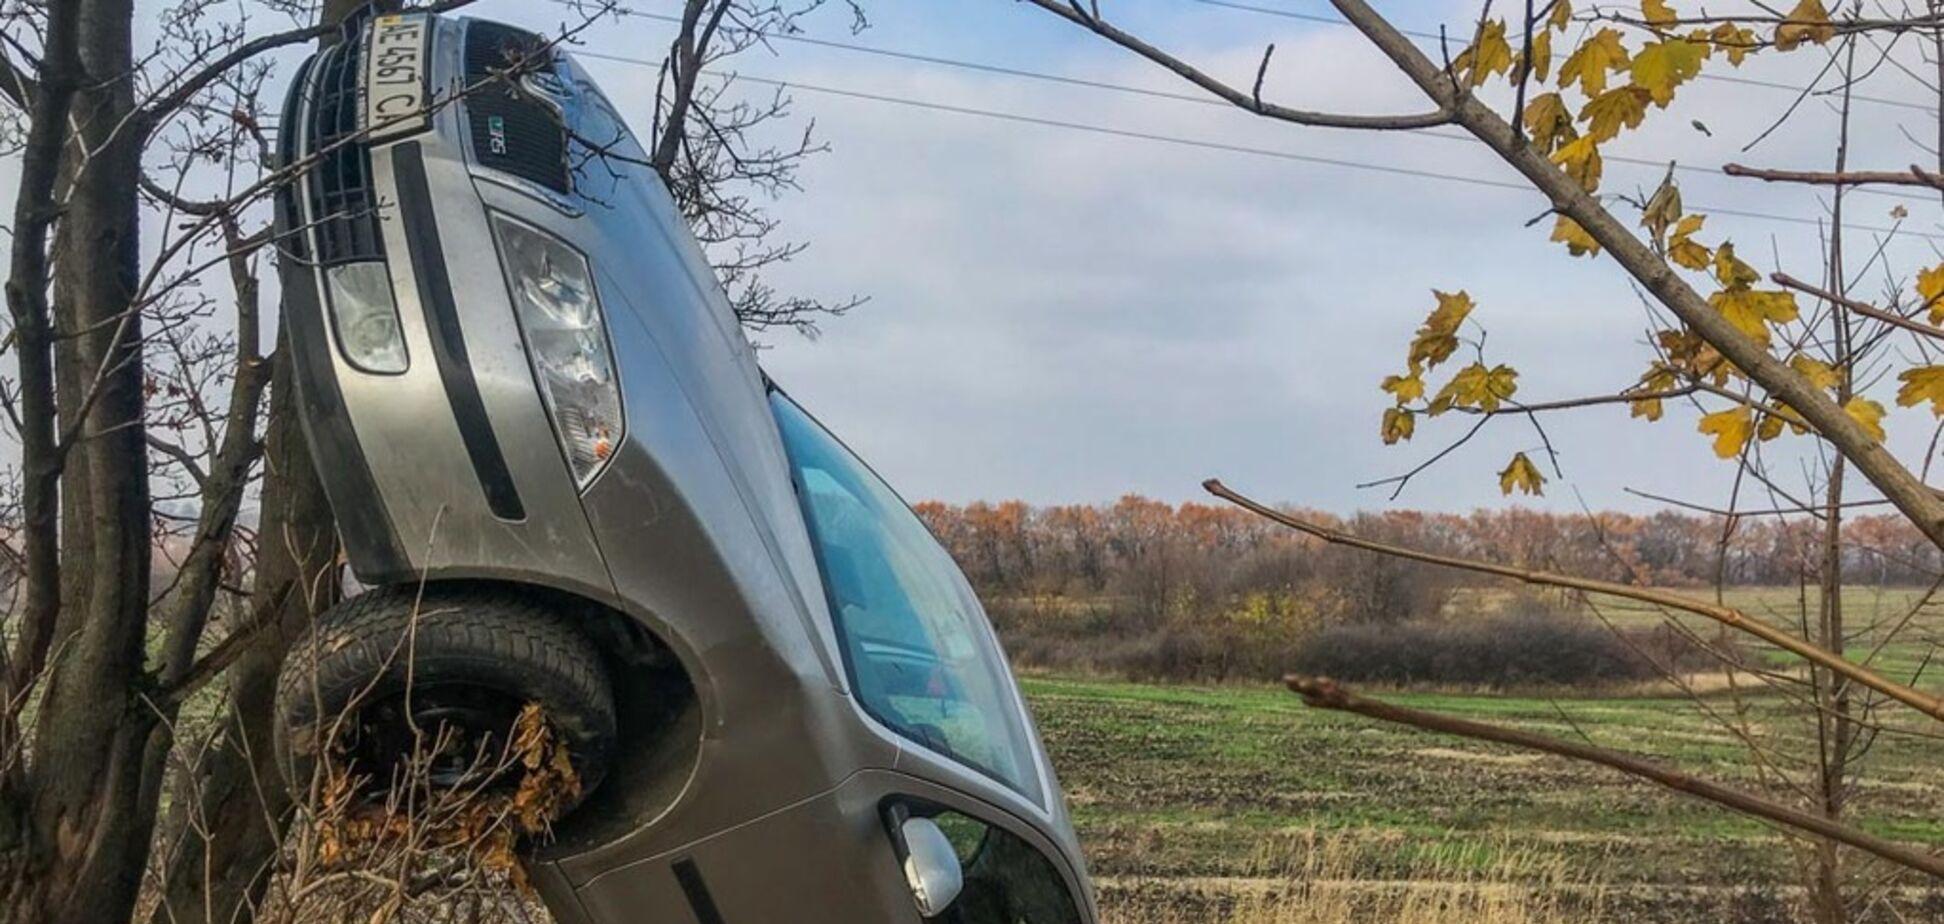 Повис на дереве: под Днепром произошло ДТП с переворотом